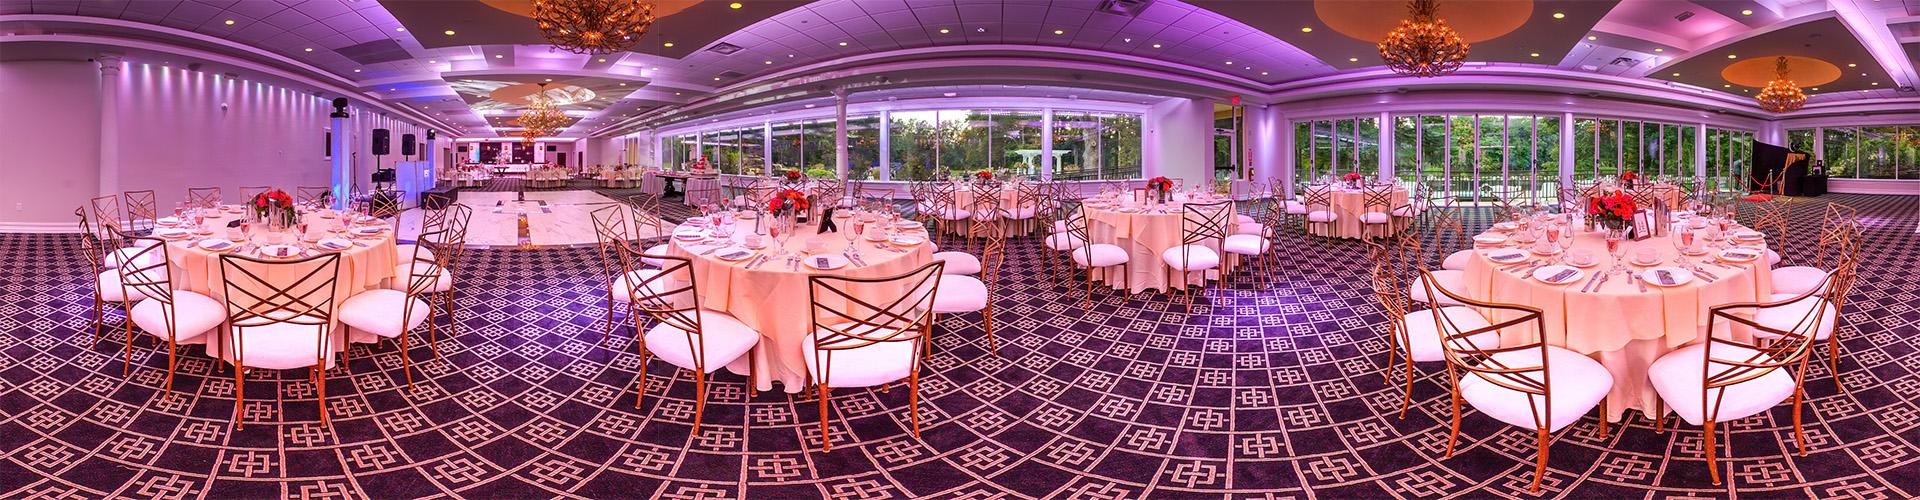 The Estate at Farrington Lake Ballroom by 360SiteVisit